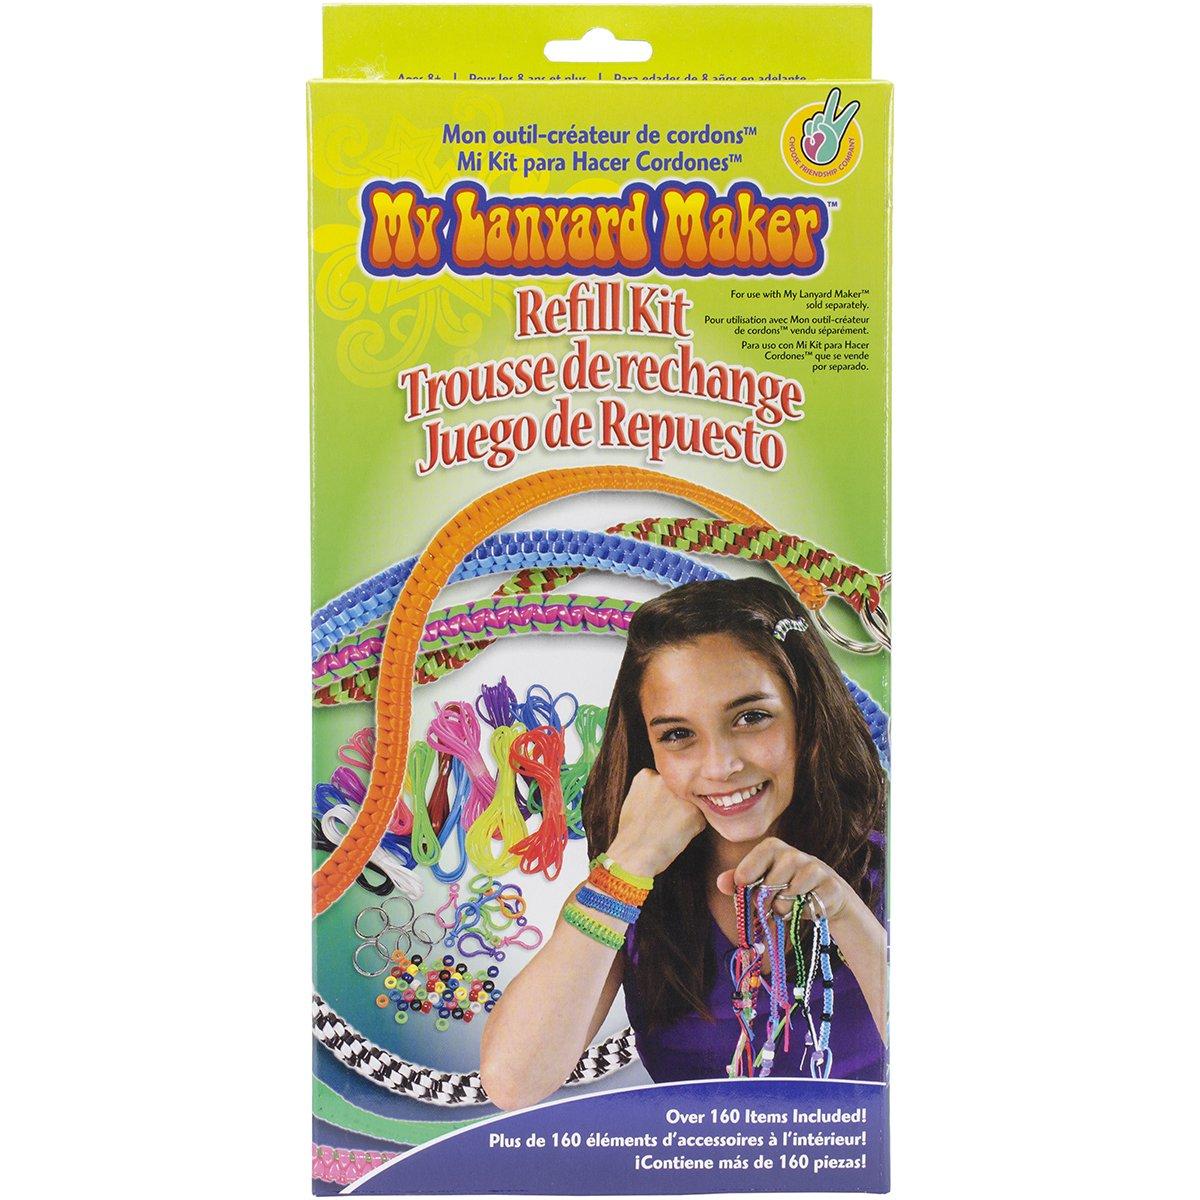 Choose Friendship My Lanyard Maker Refill Kit, 160 items